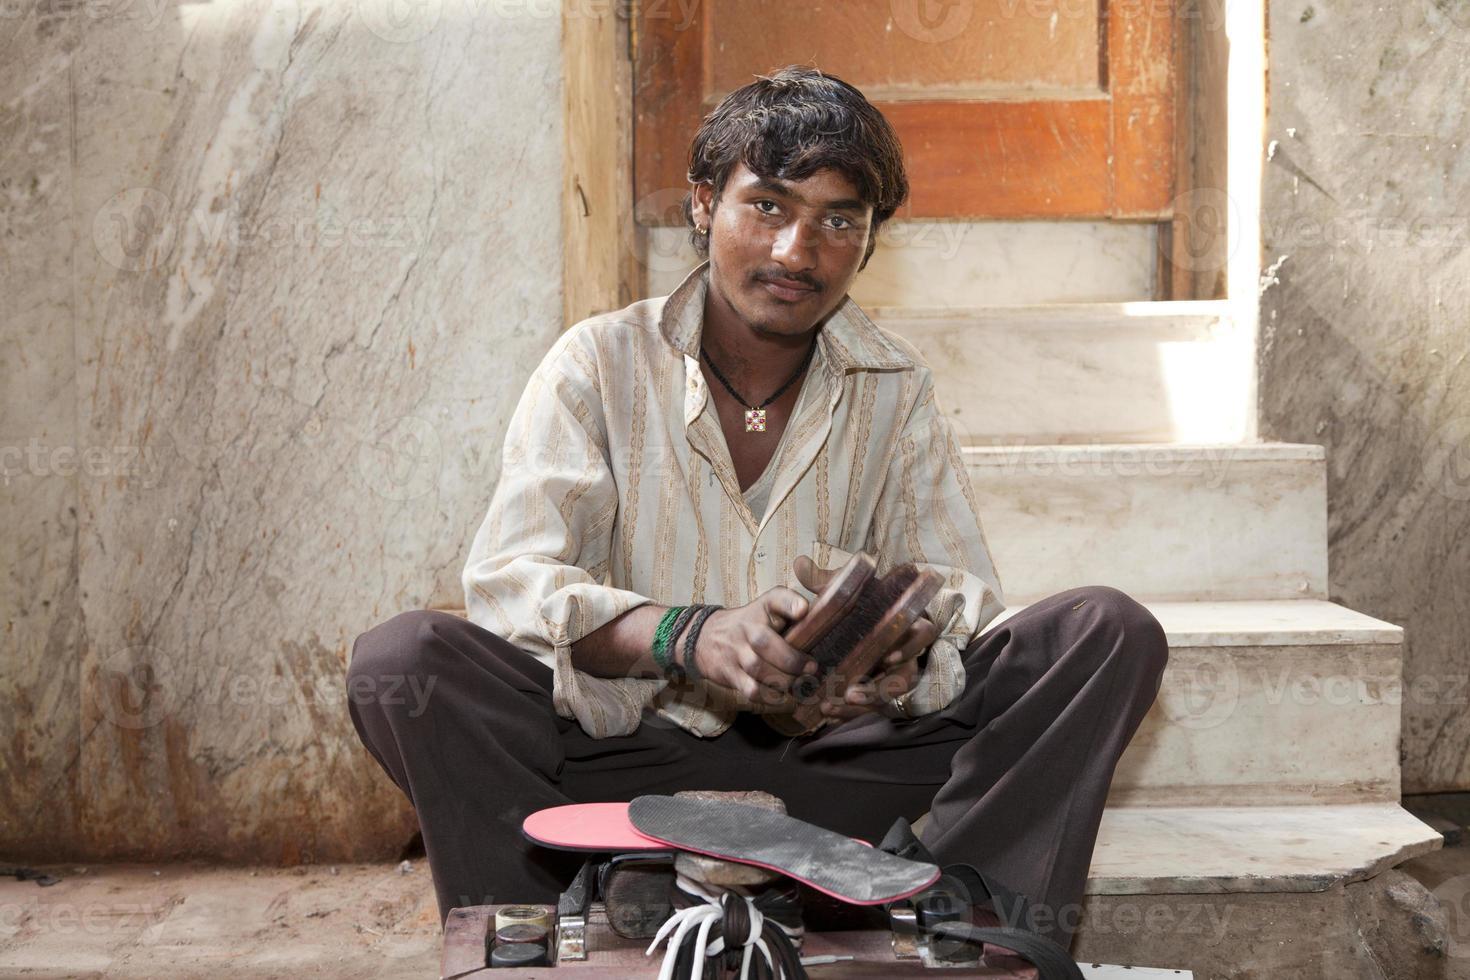 olho roxo sapato indiano nas ruas de Nova Deli foto